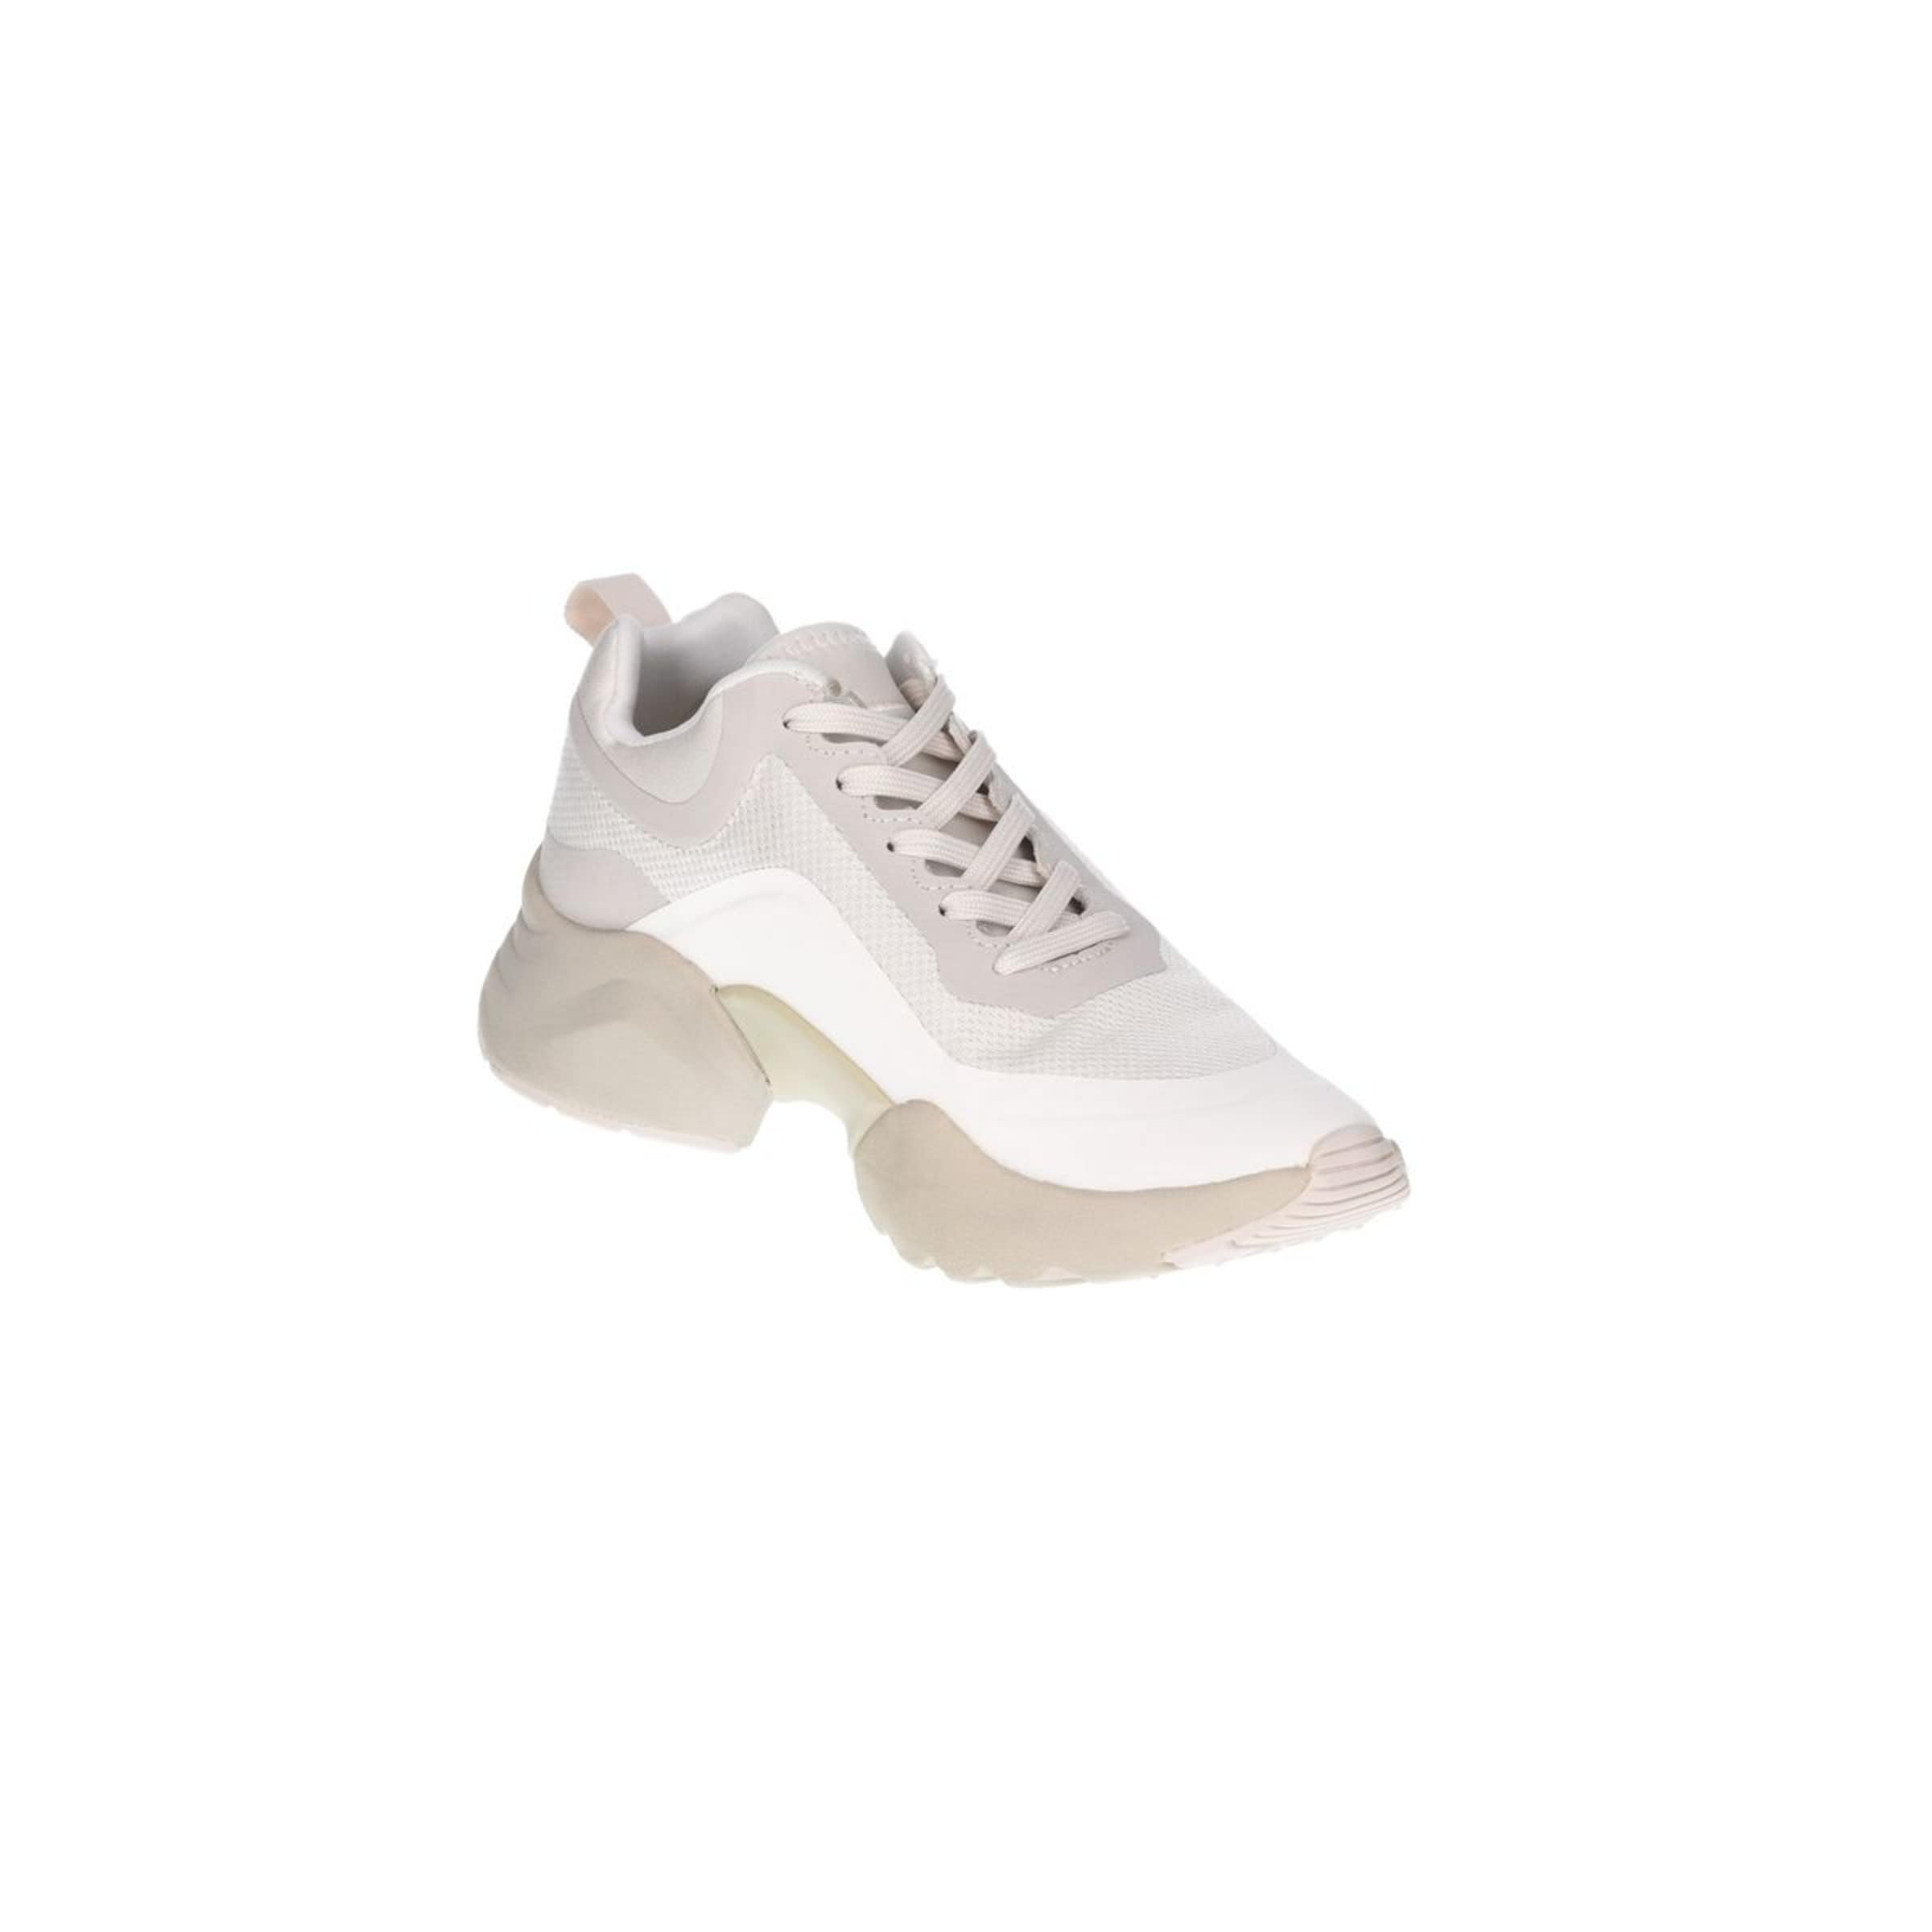 Sneaker BeigeGrau In BeigeGrau In Sneaker Sneaker In Tamaris Tamaris Tamaris W2ID9YEH